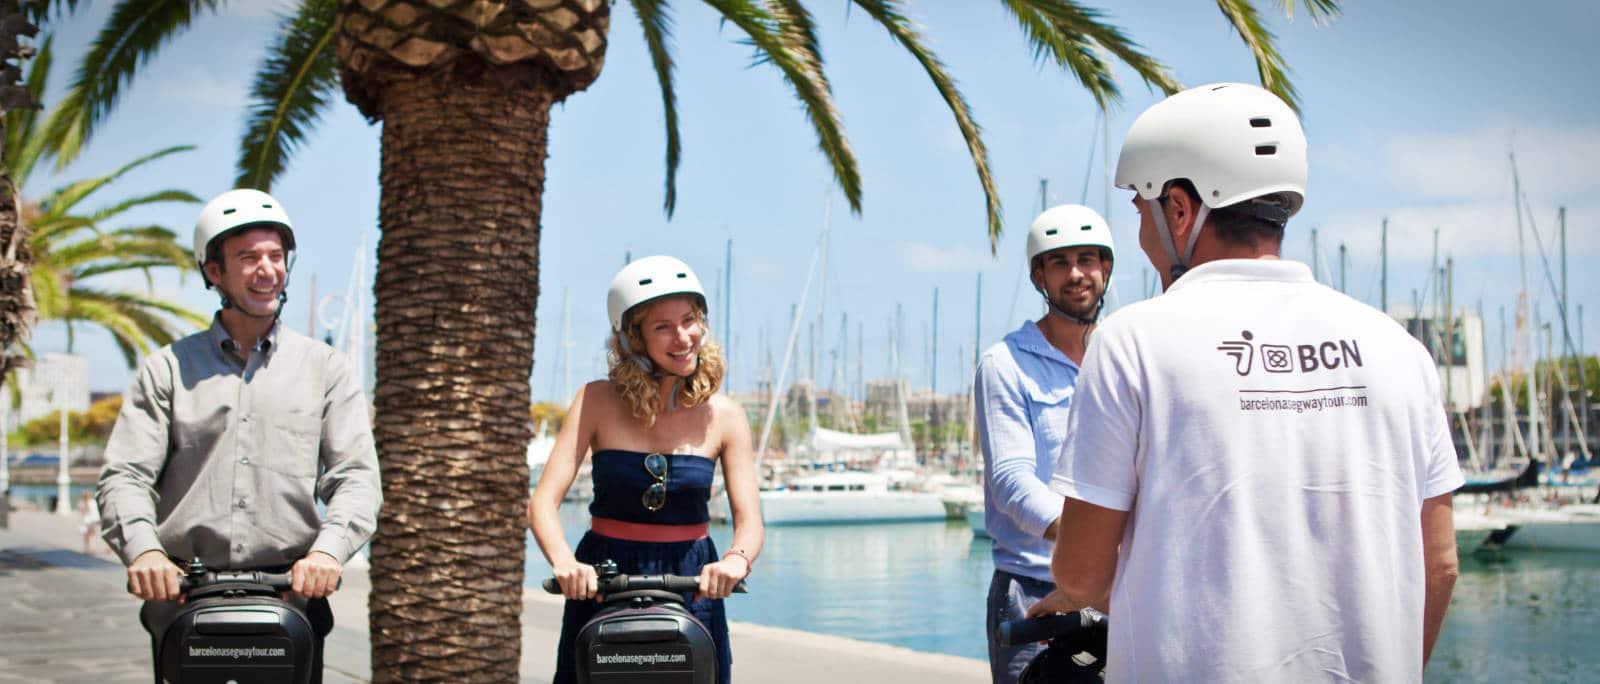 Barcelona Segway Tour Port Vell